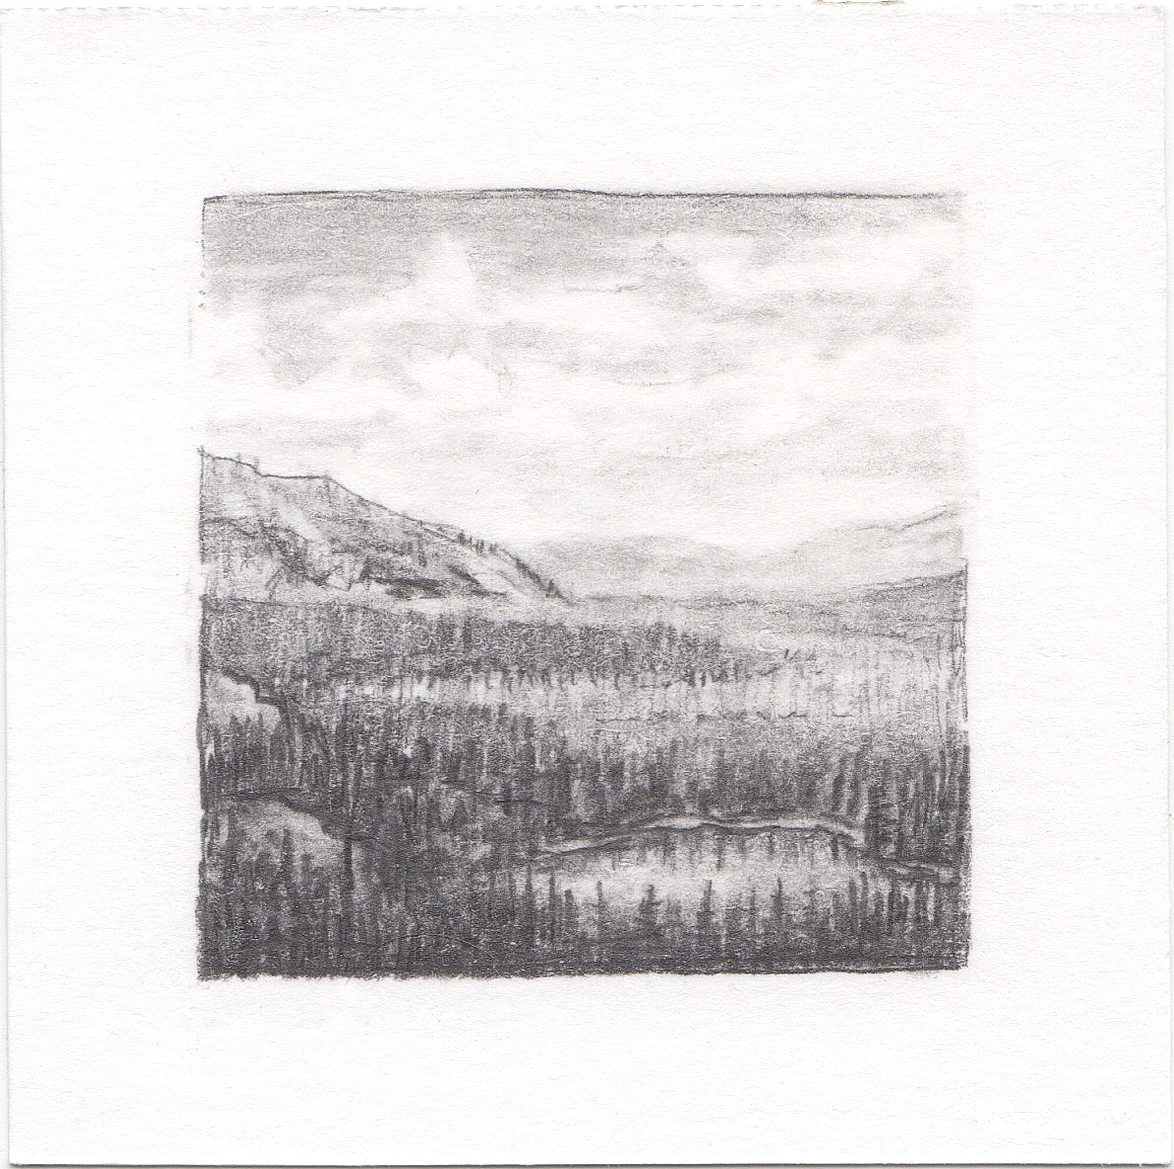 #66 Uinta Mountains, Utah | 3x3 | graphite